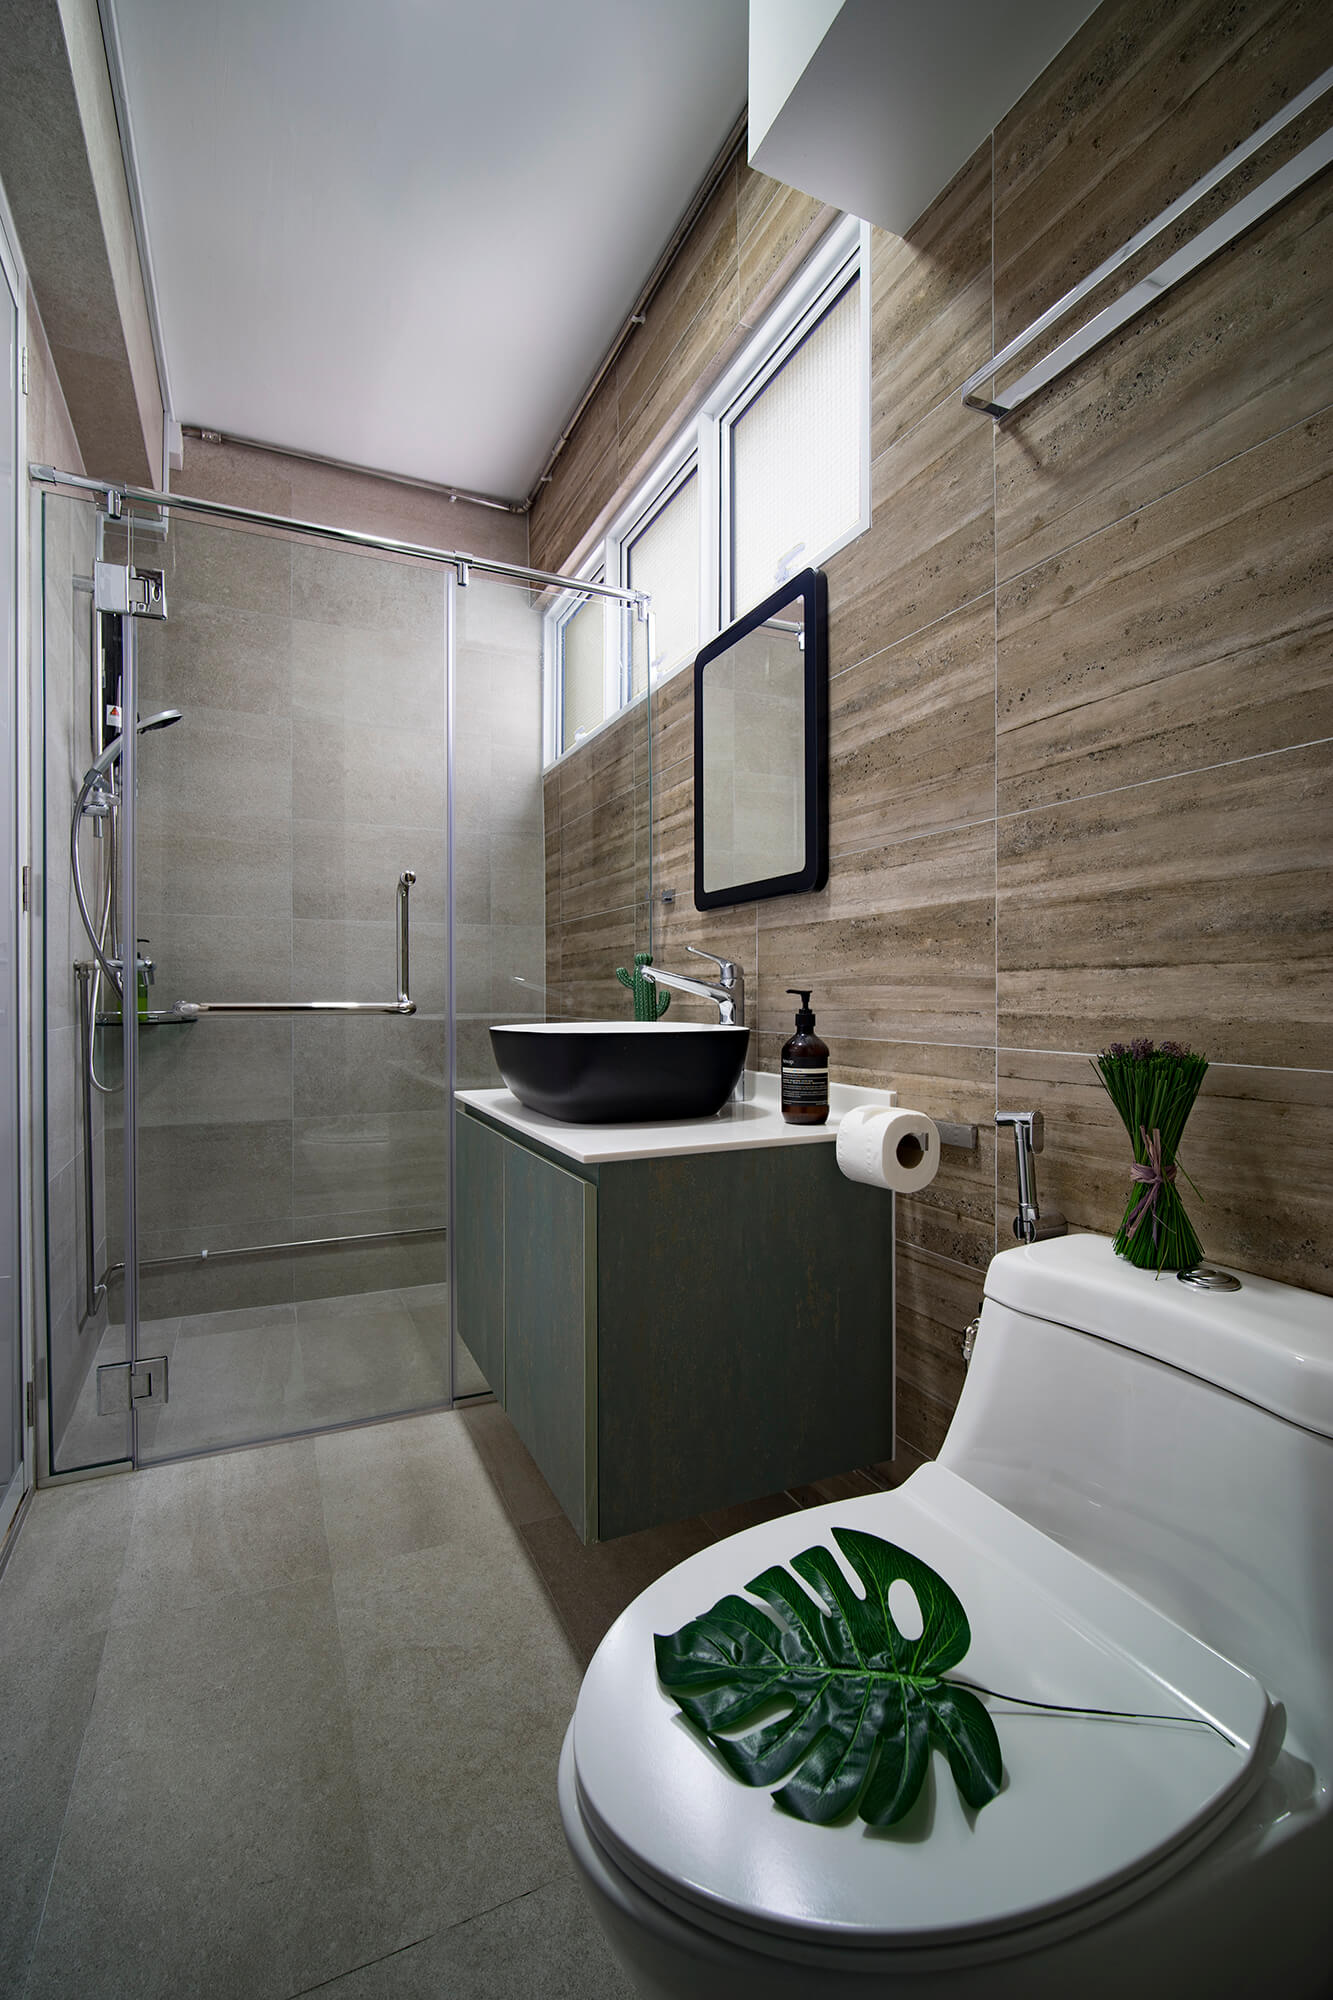 Interior Design For Hdb: Shunfu Road HDB Before & After Interior Design & Renovation